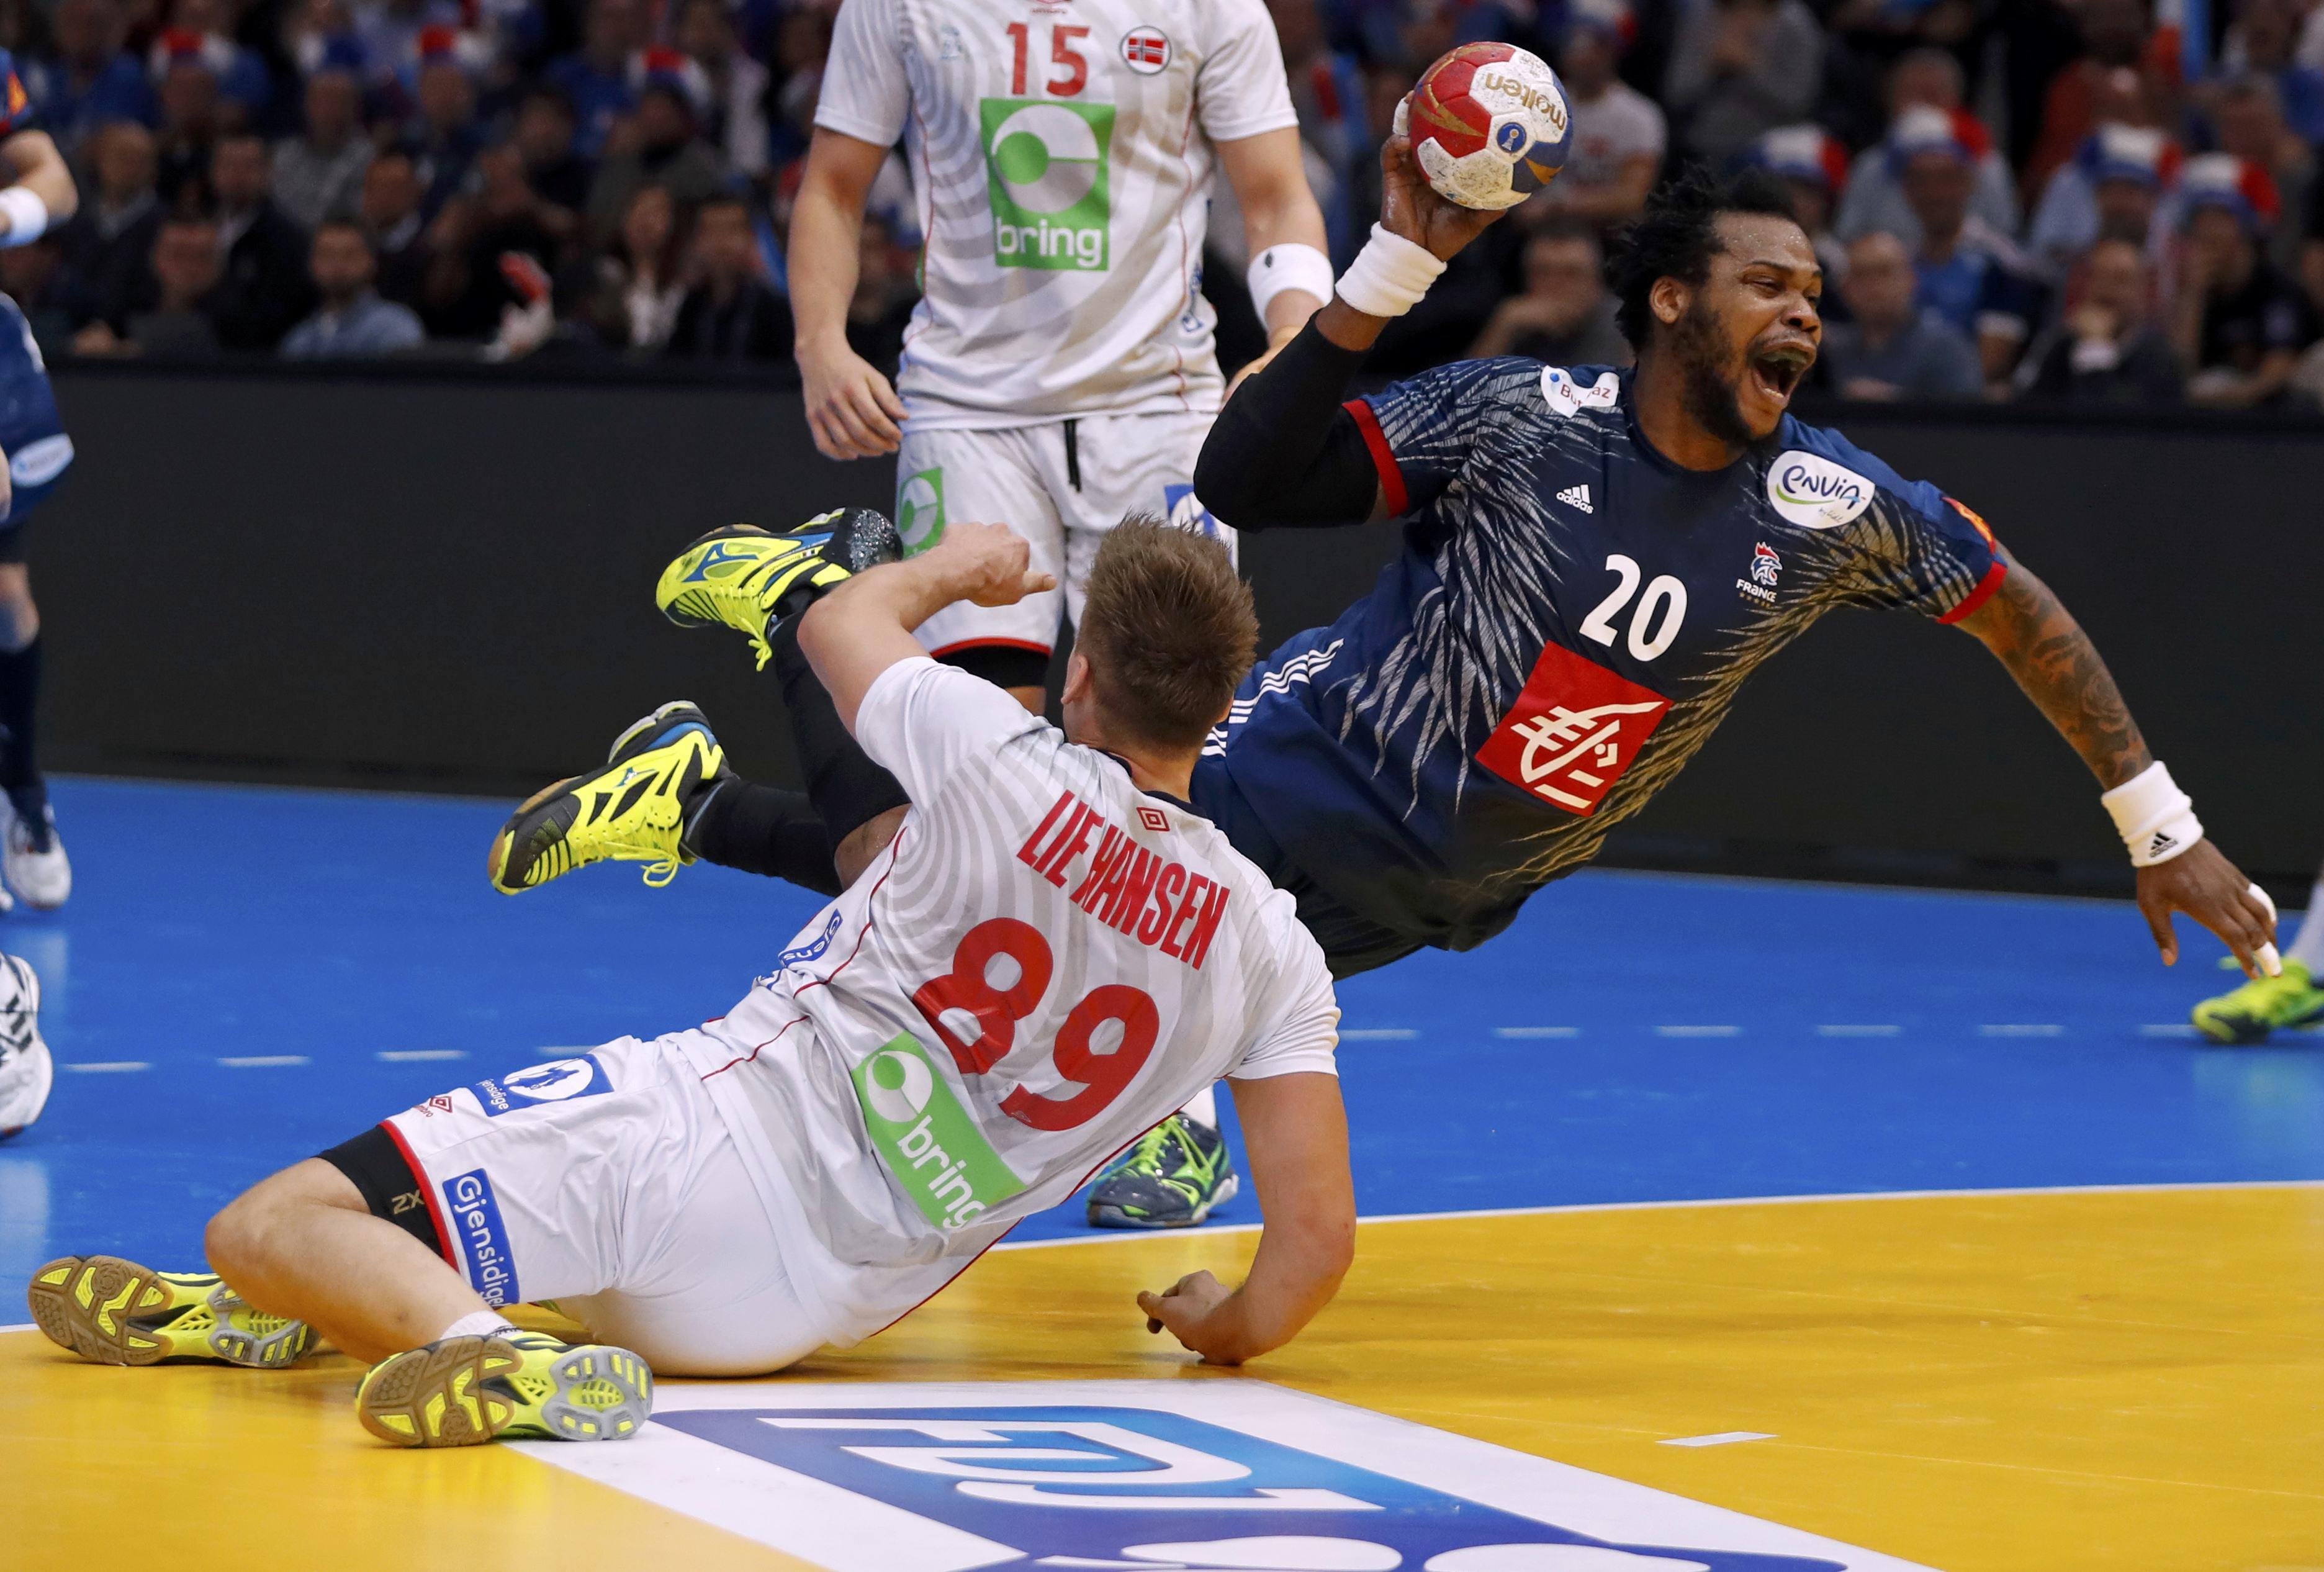 Men's Handball - France v Norway - 2017 Men's World Championship, Final - AccorHotels Arena, Paris, France - 29/01/17 - France's Cedric Sorhaindo in action.    REUTERS/Charles Platiau